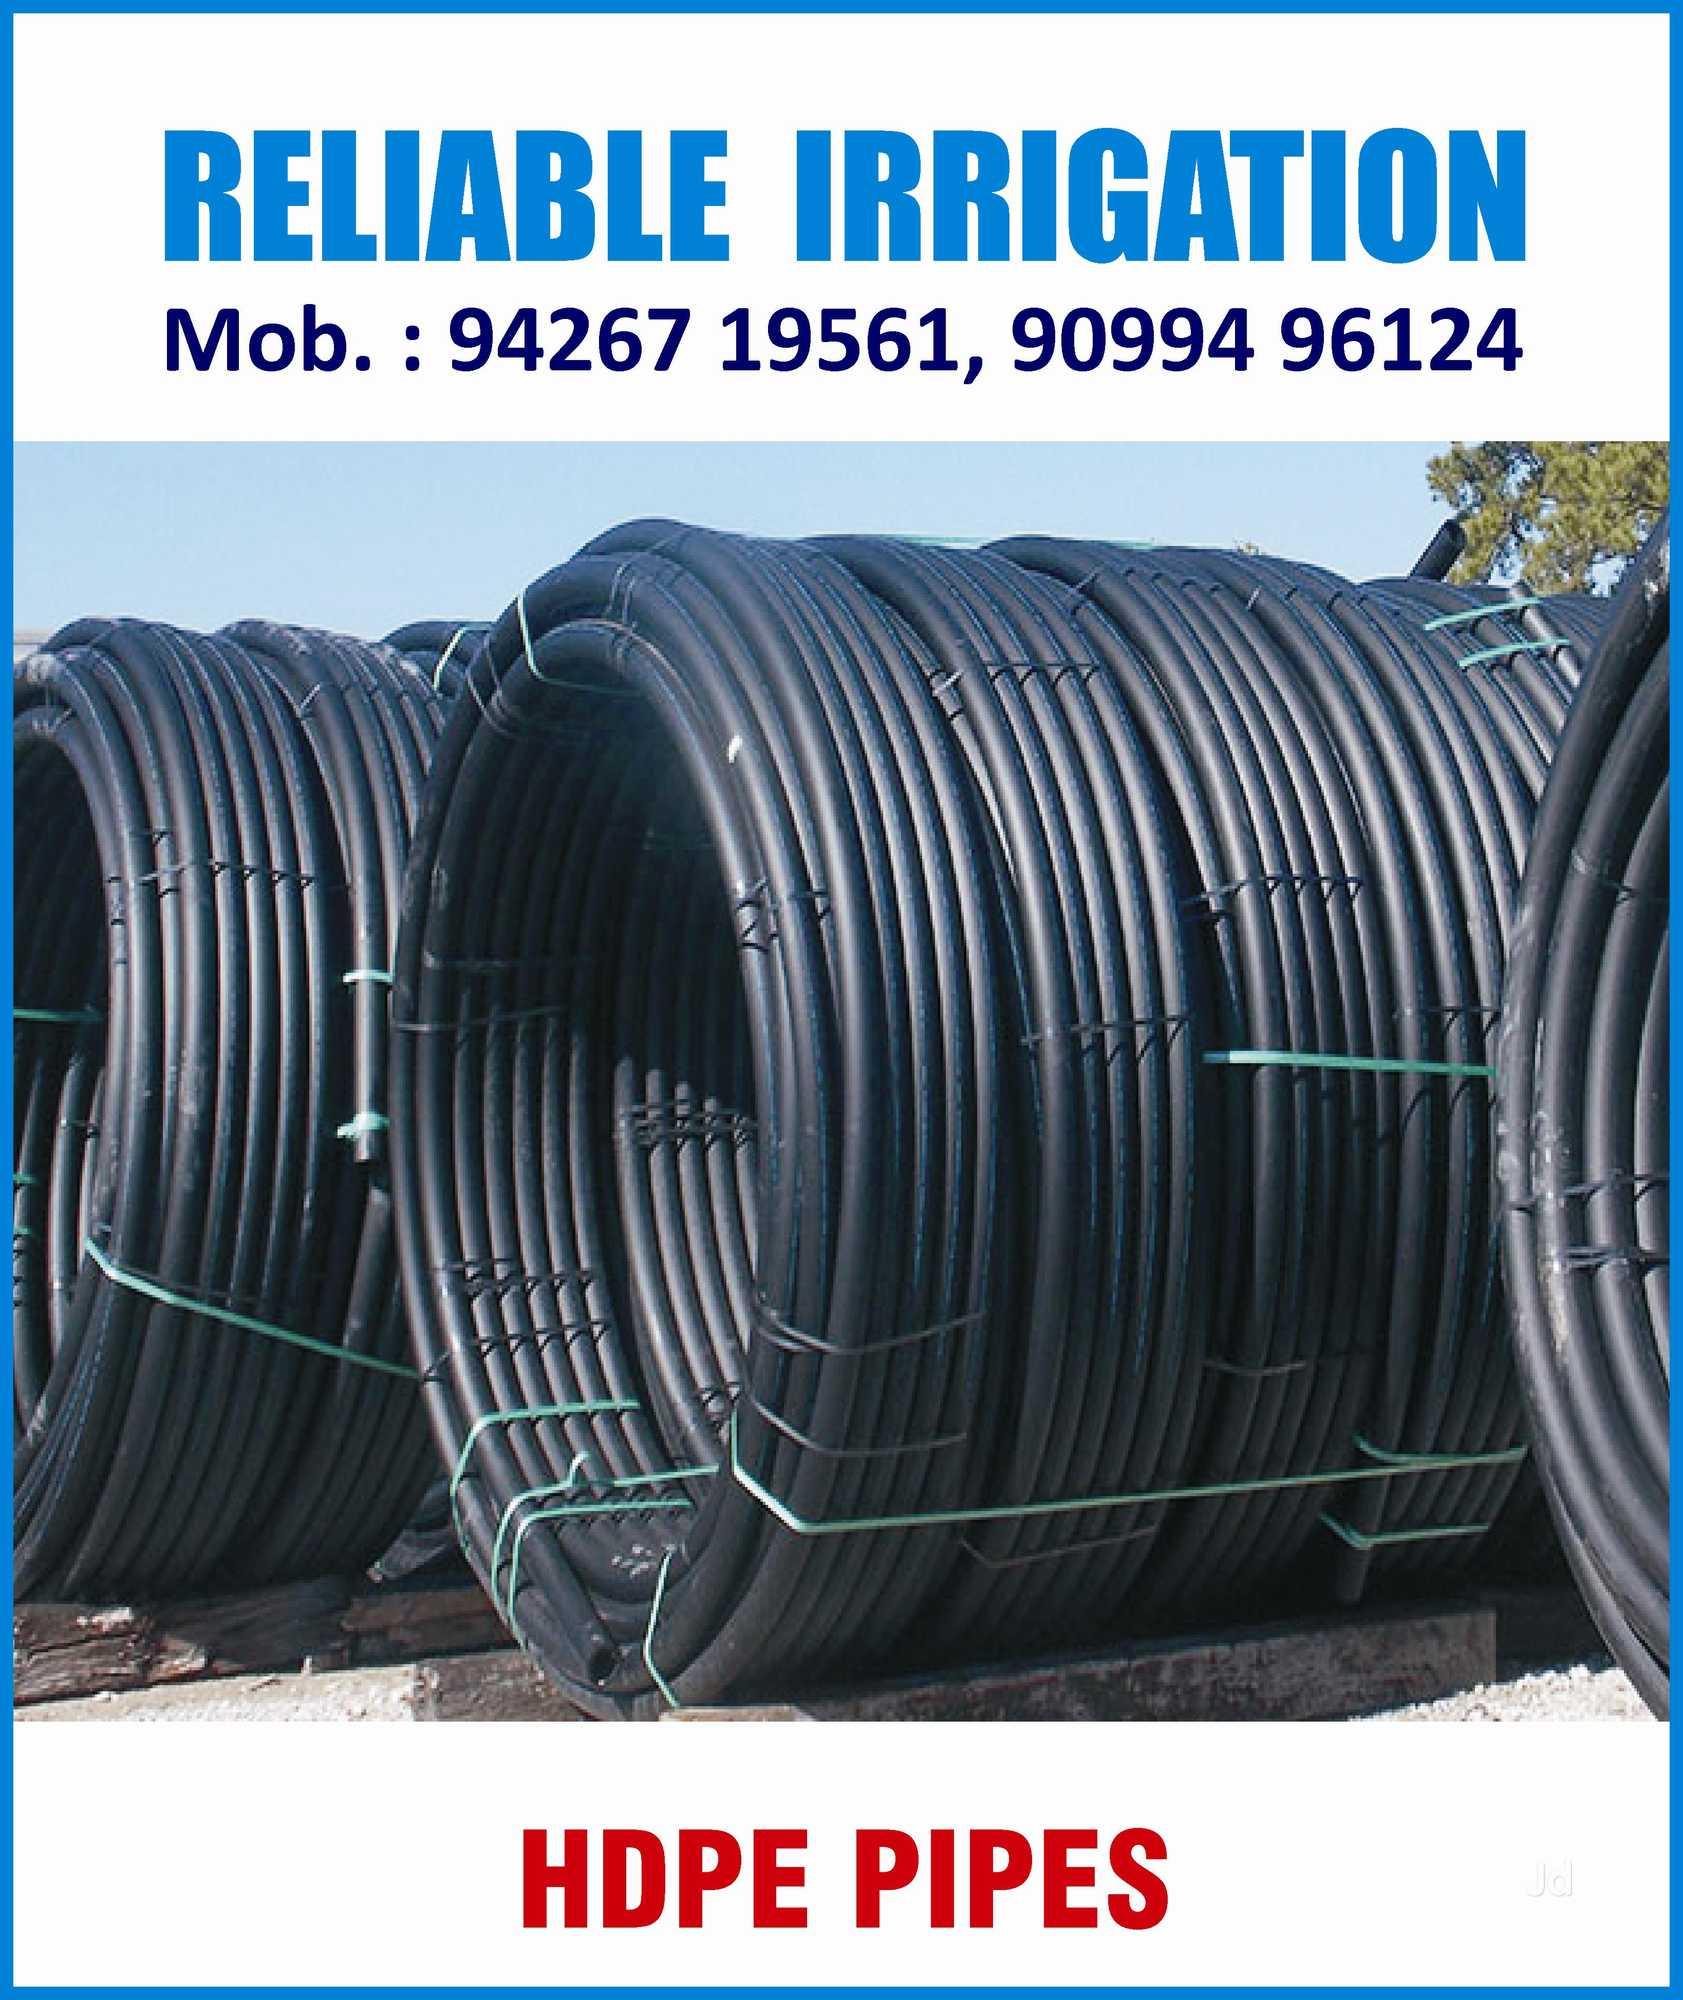 Top 50 Upvc Pipe Manufacturers in Rajkot - Best Pvc Pipe